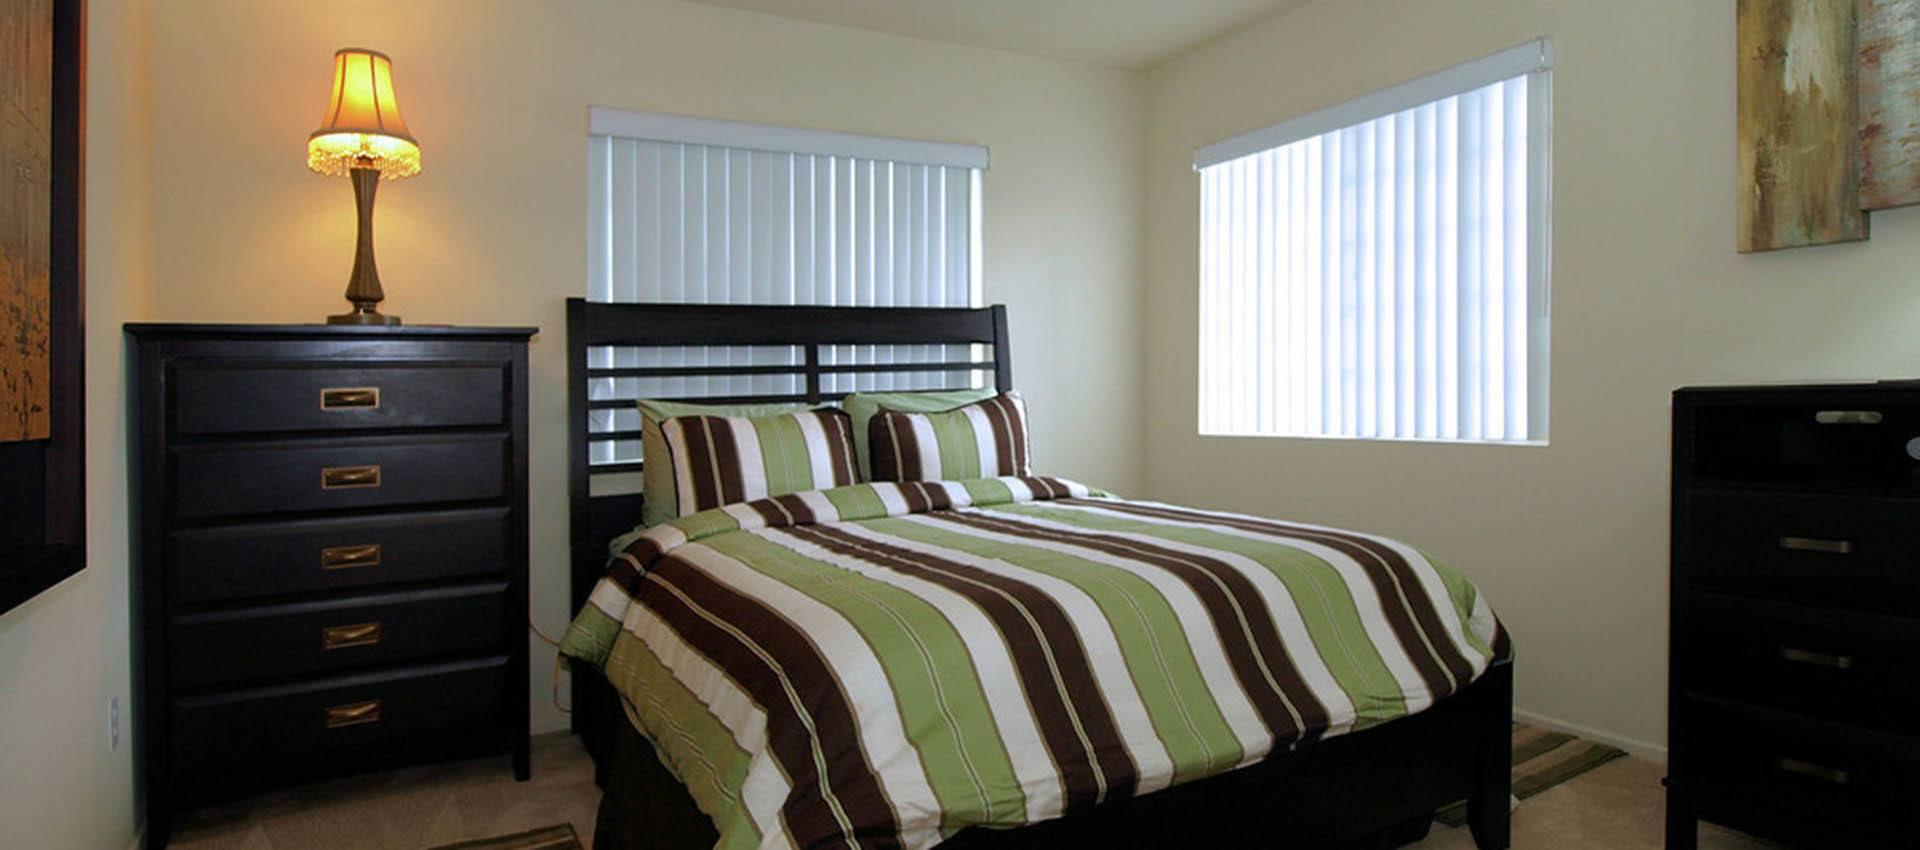 Master Bedroom at Cypress Villas Apartment Homes in Redlands, CA